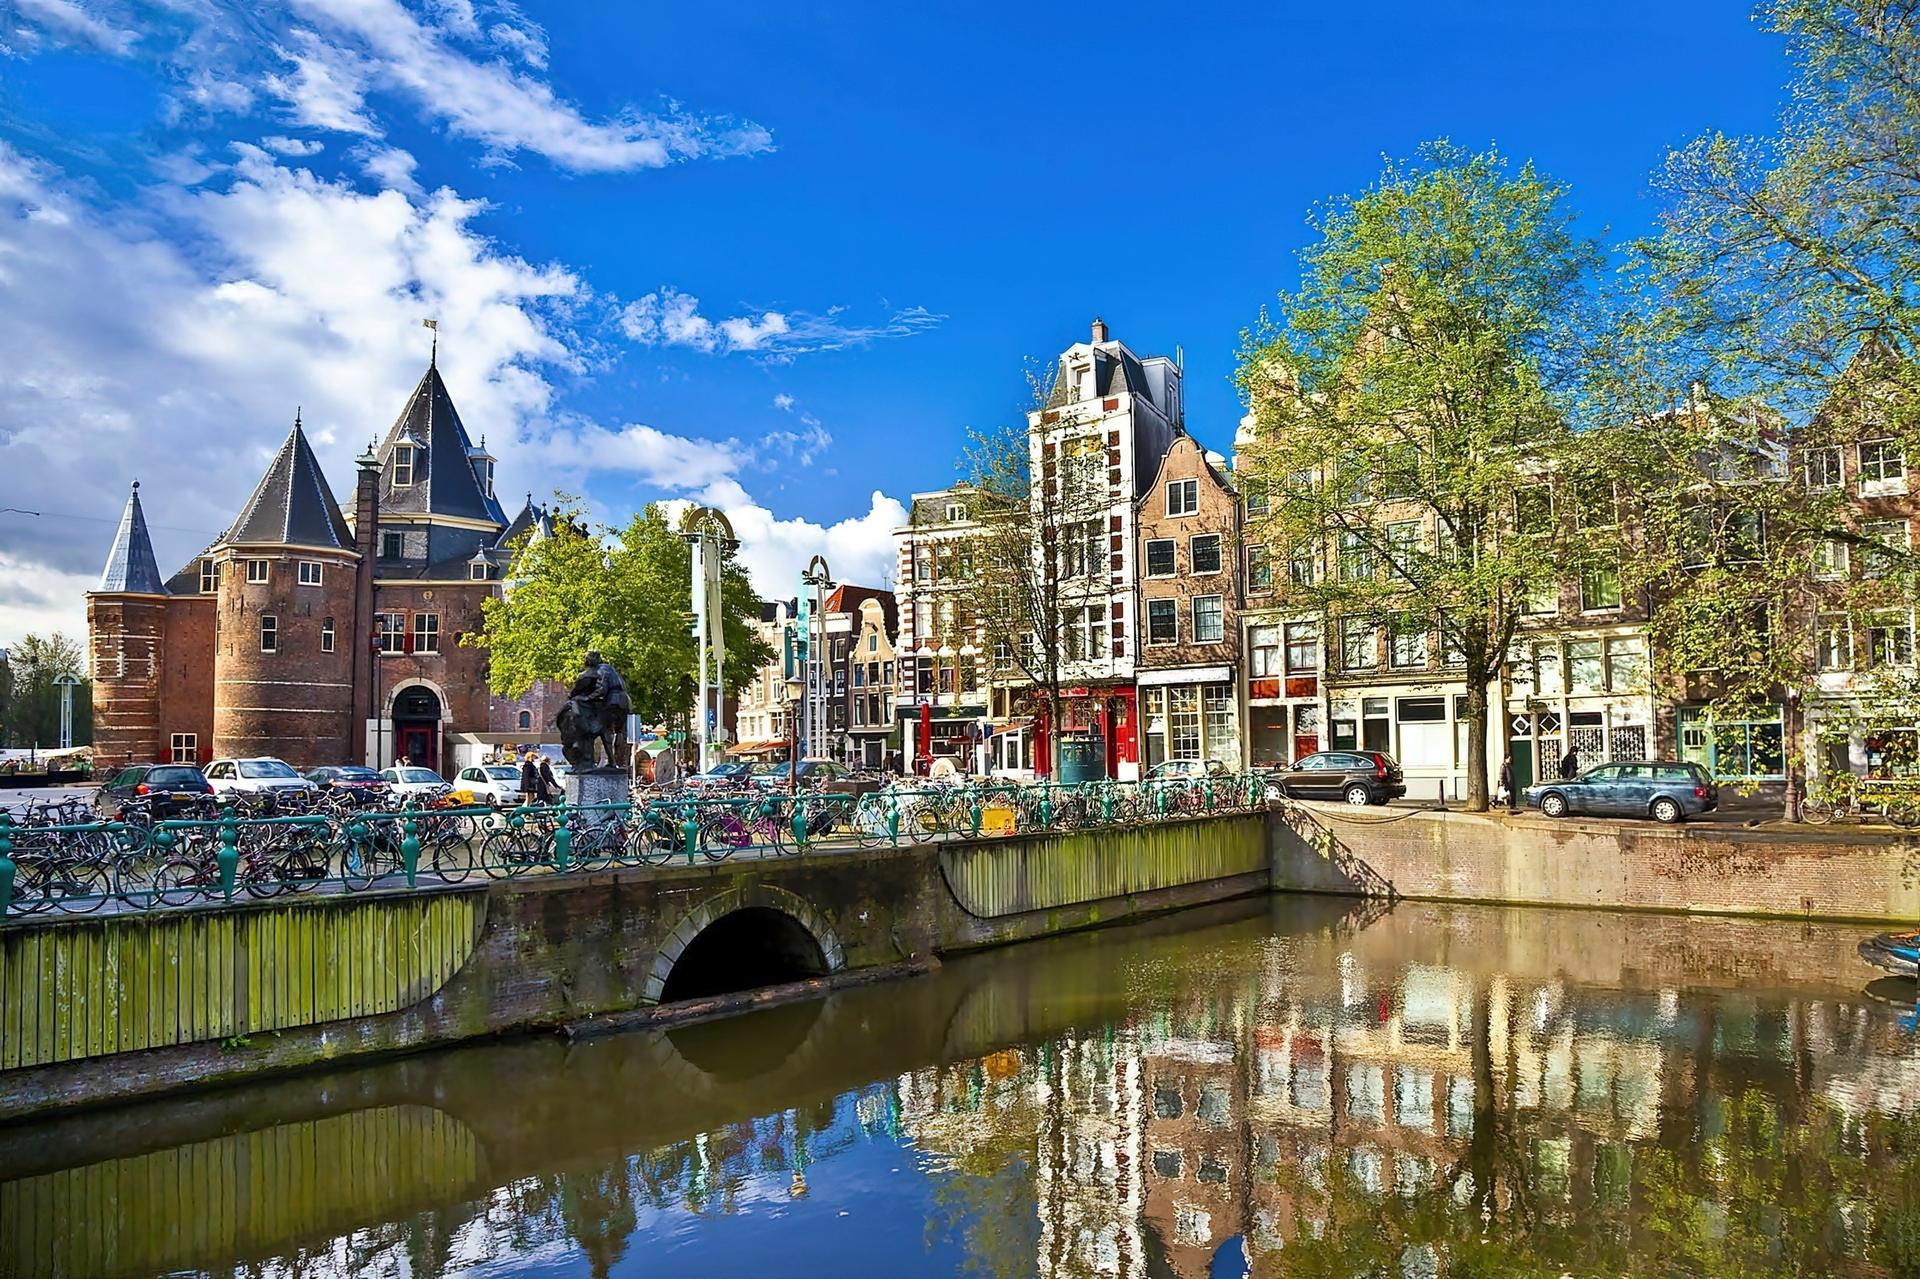 199649_amsterdam_panorama_miasta_kanal_most_rowery.jpg